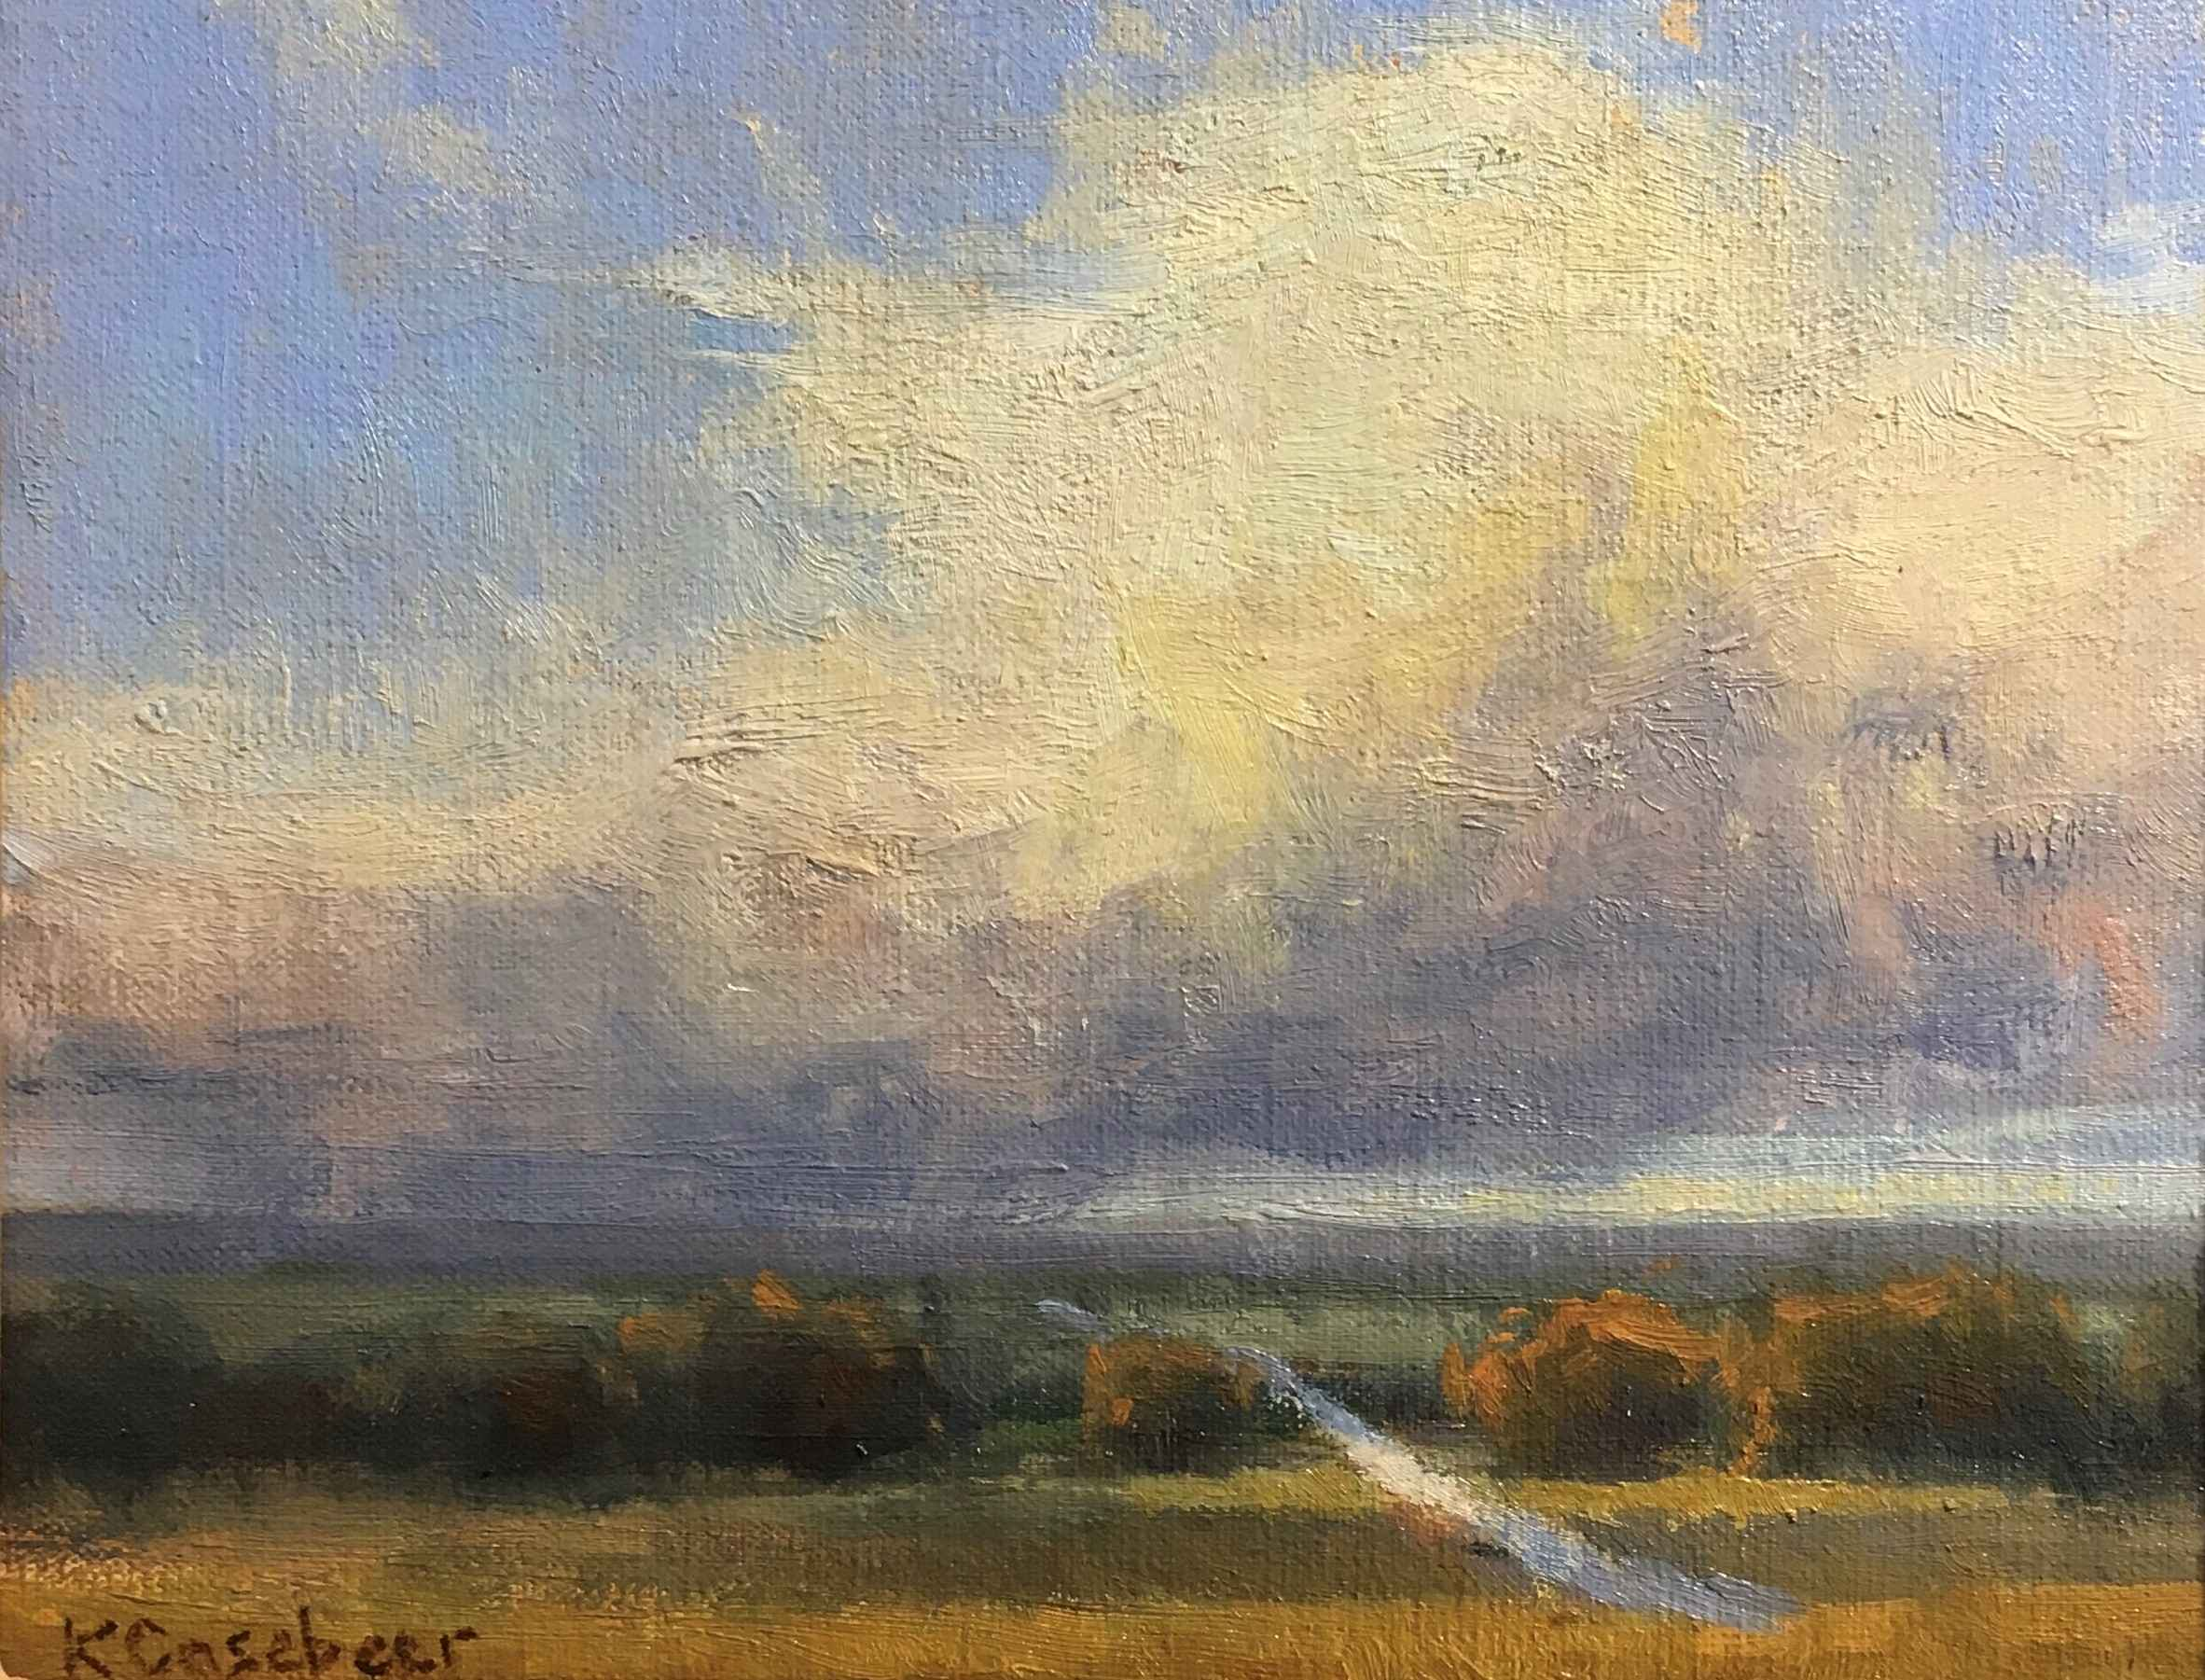 Hanging Cloud by  Kim Casebeer - Masterpiece Online